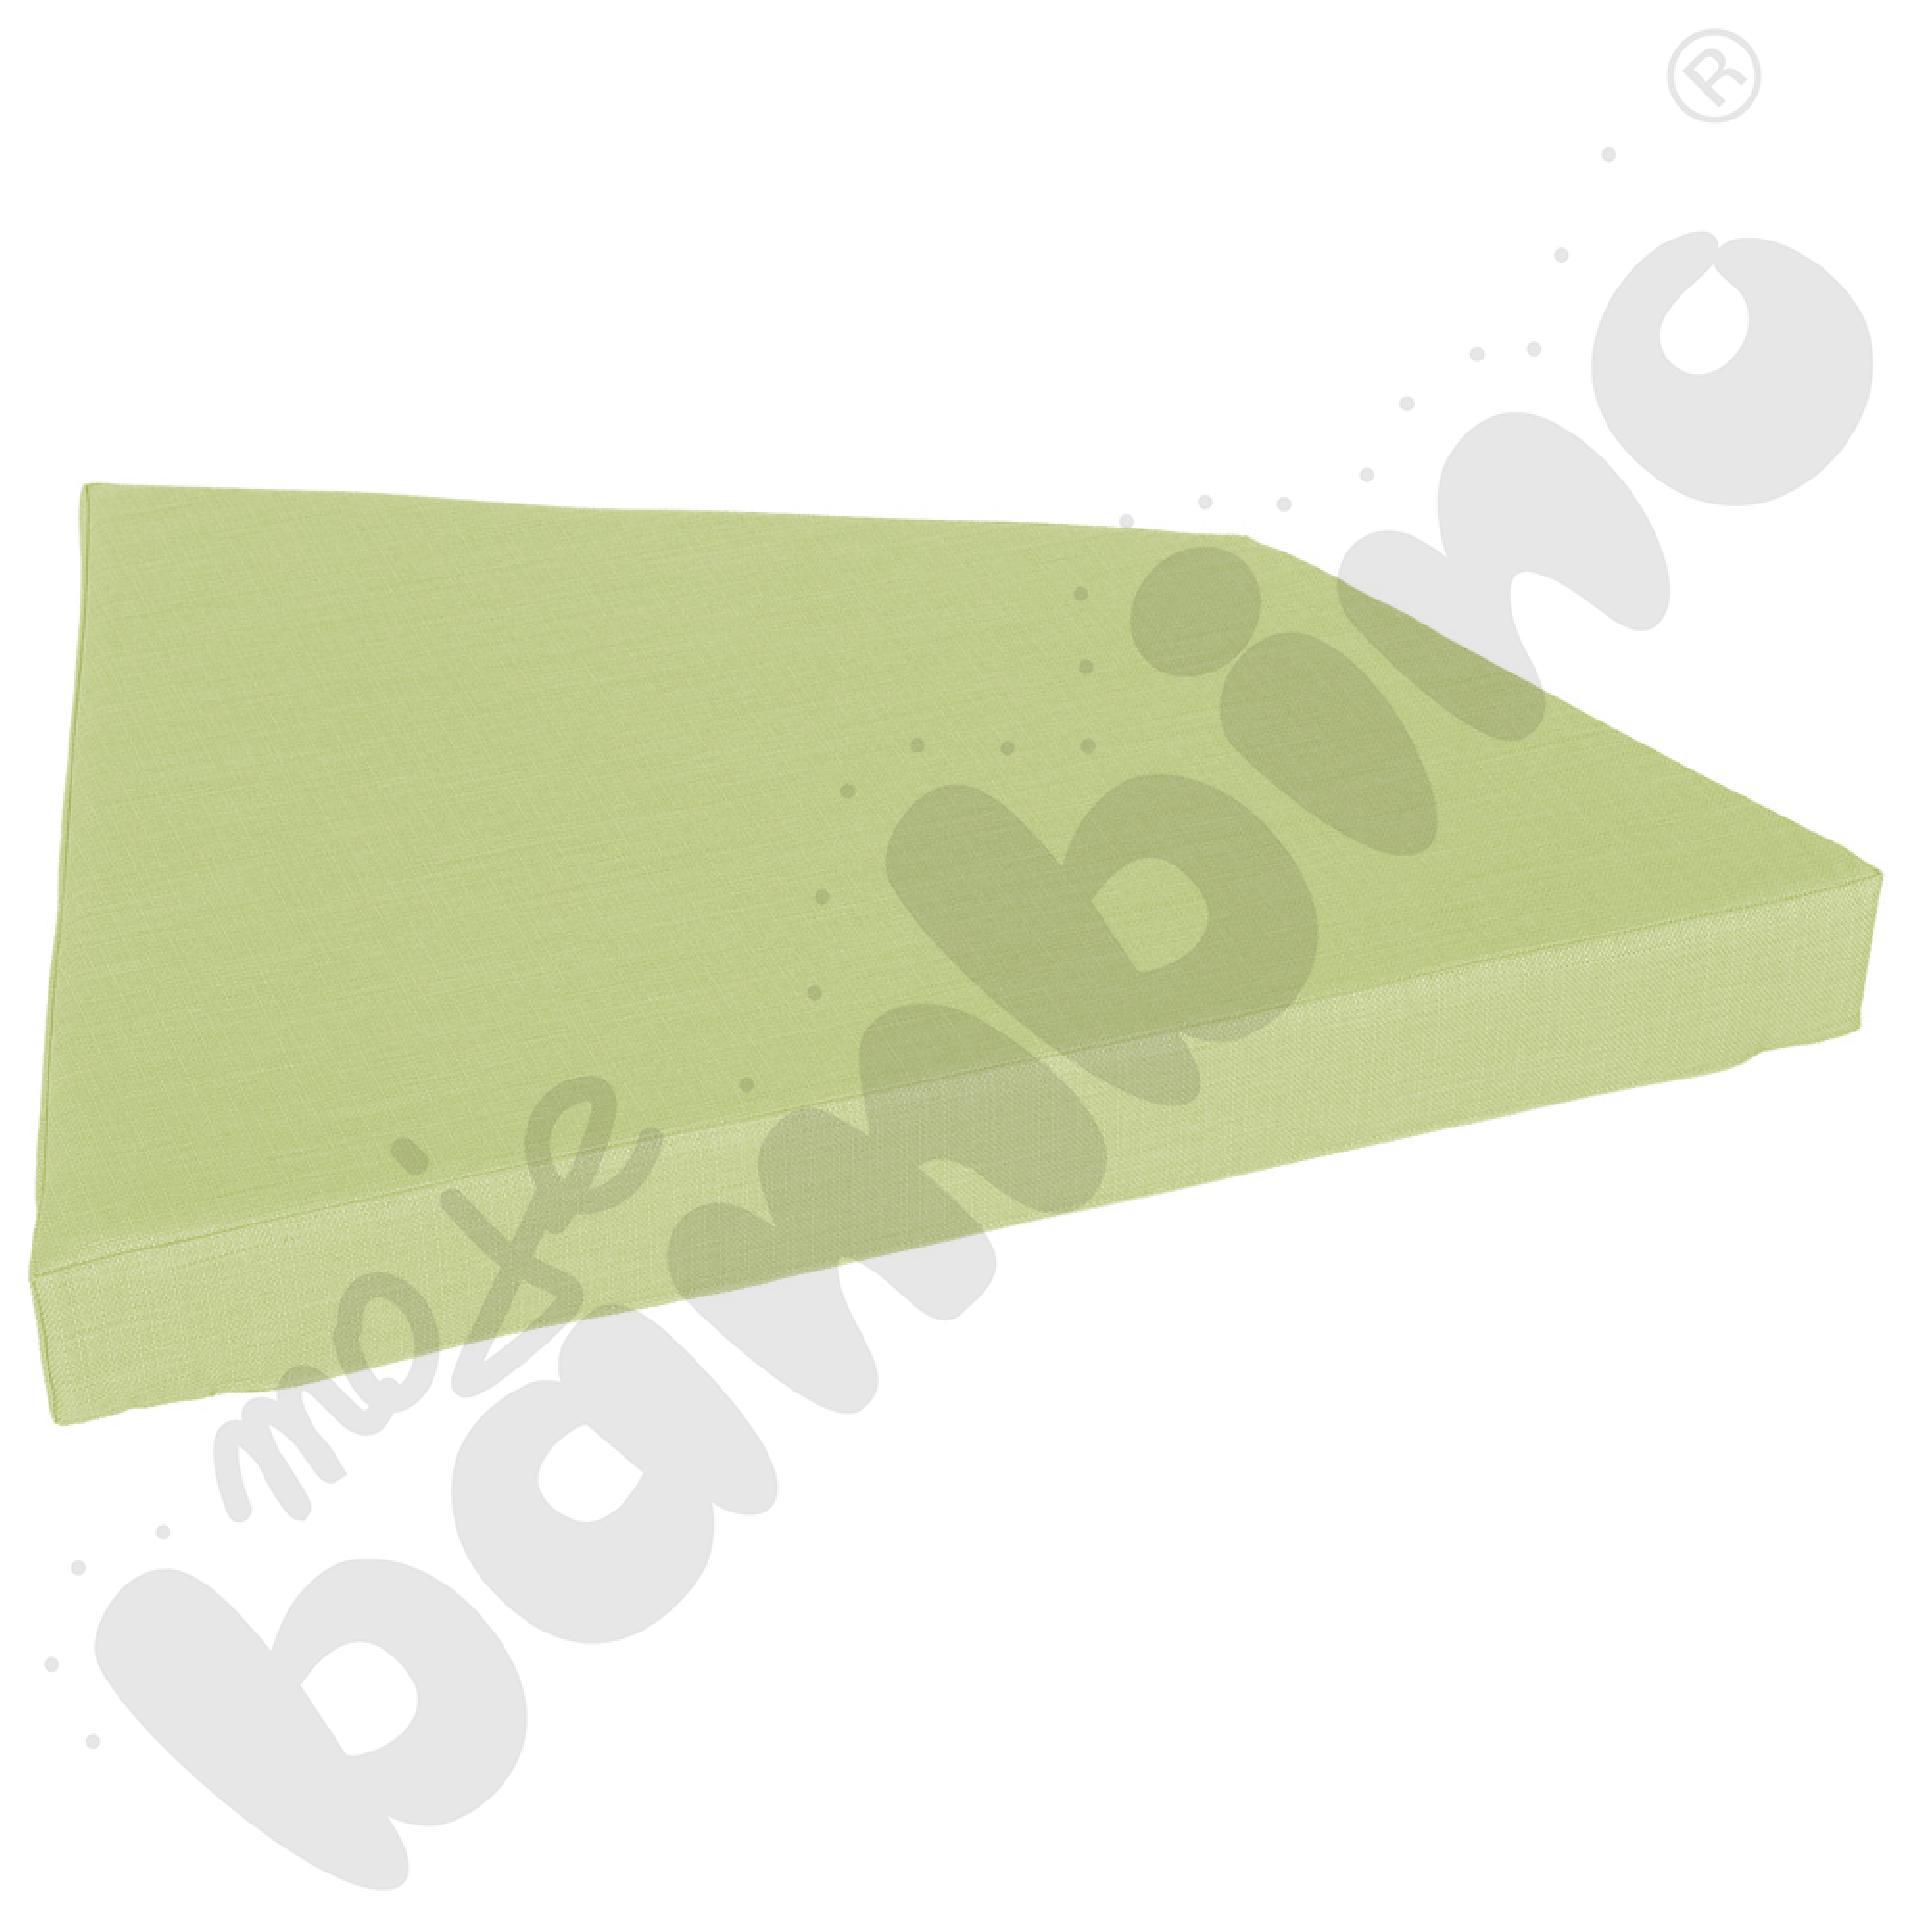 Materac Quadro 1 jasnozielony, wys. 10 cm